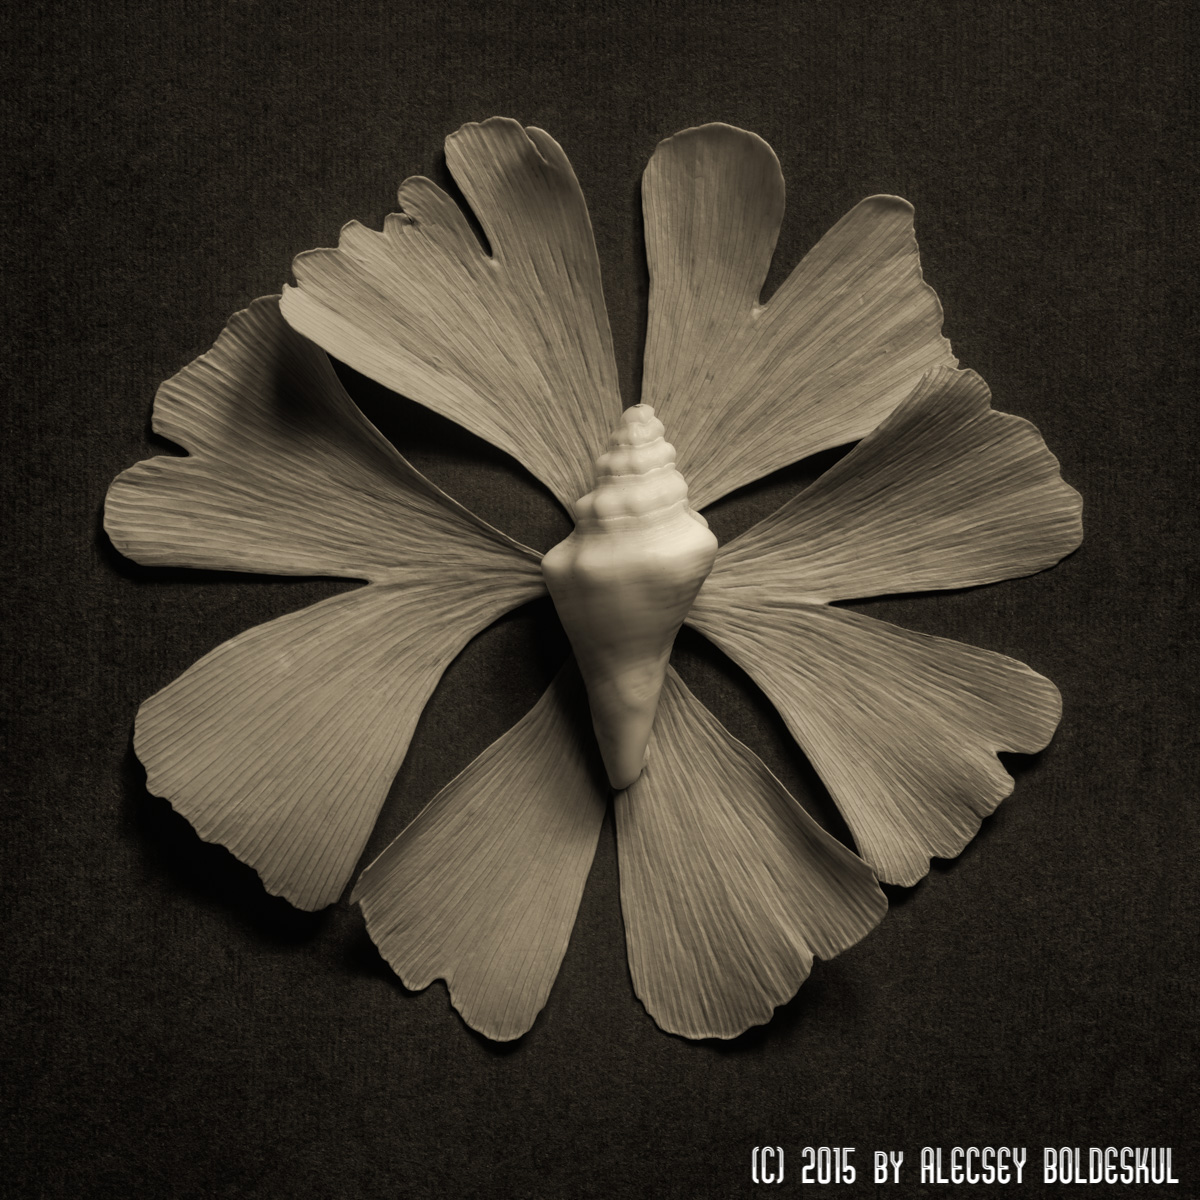 Organic Form Photography